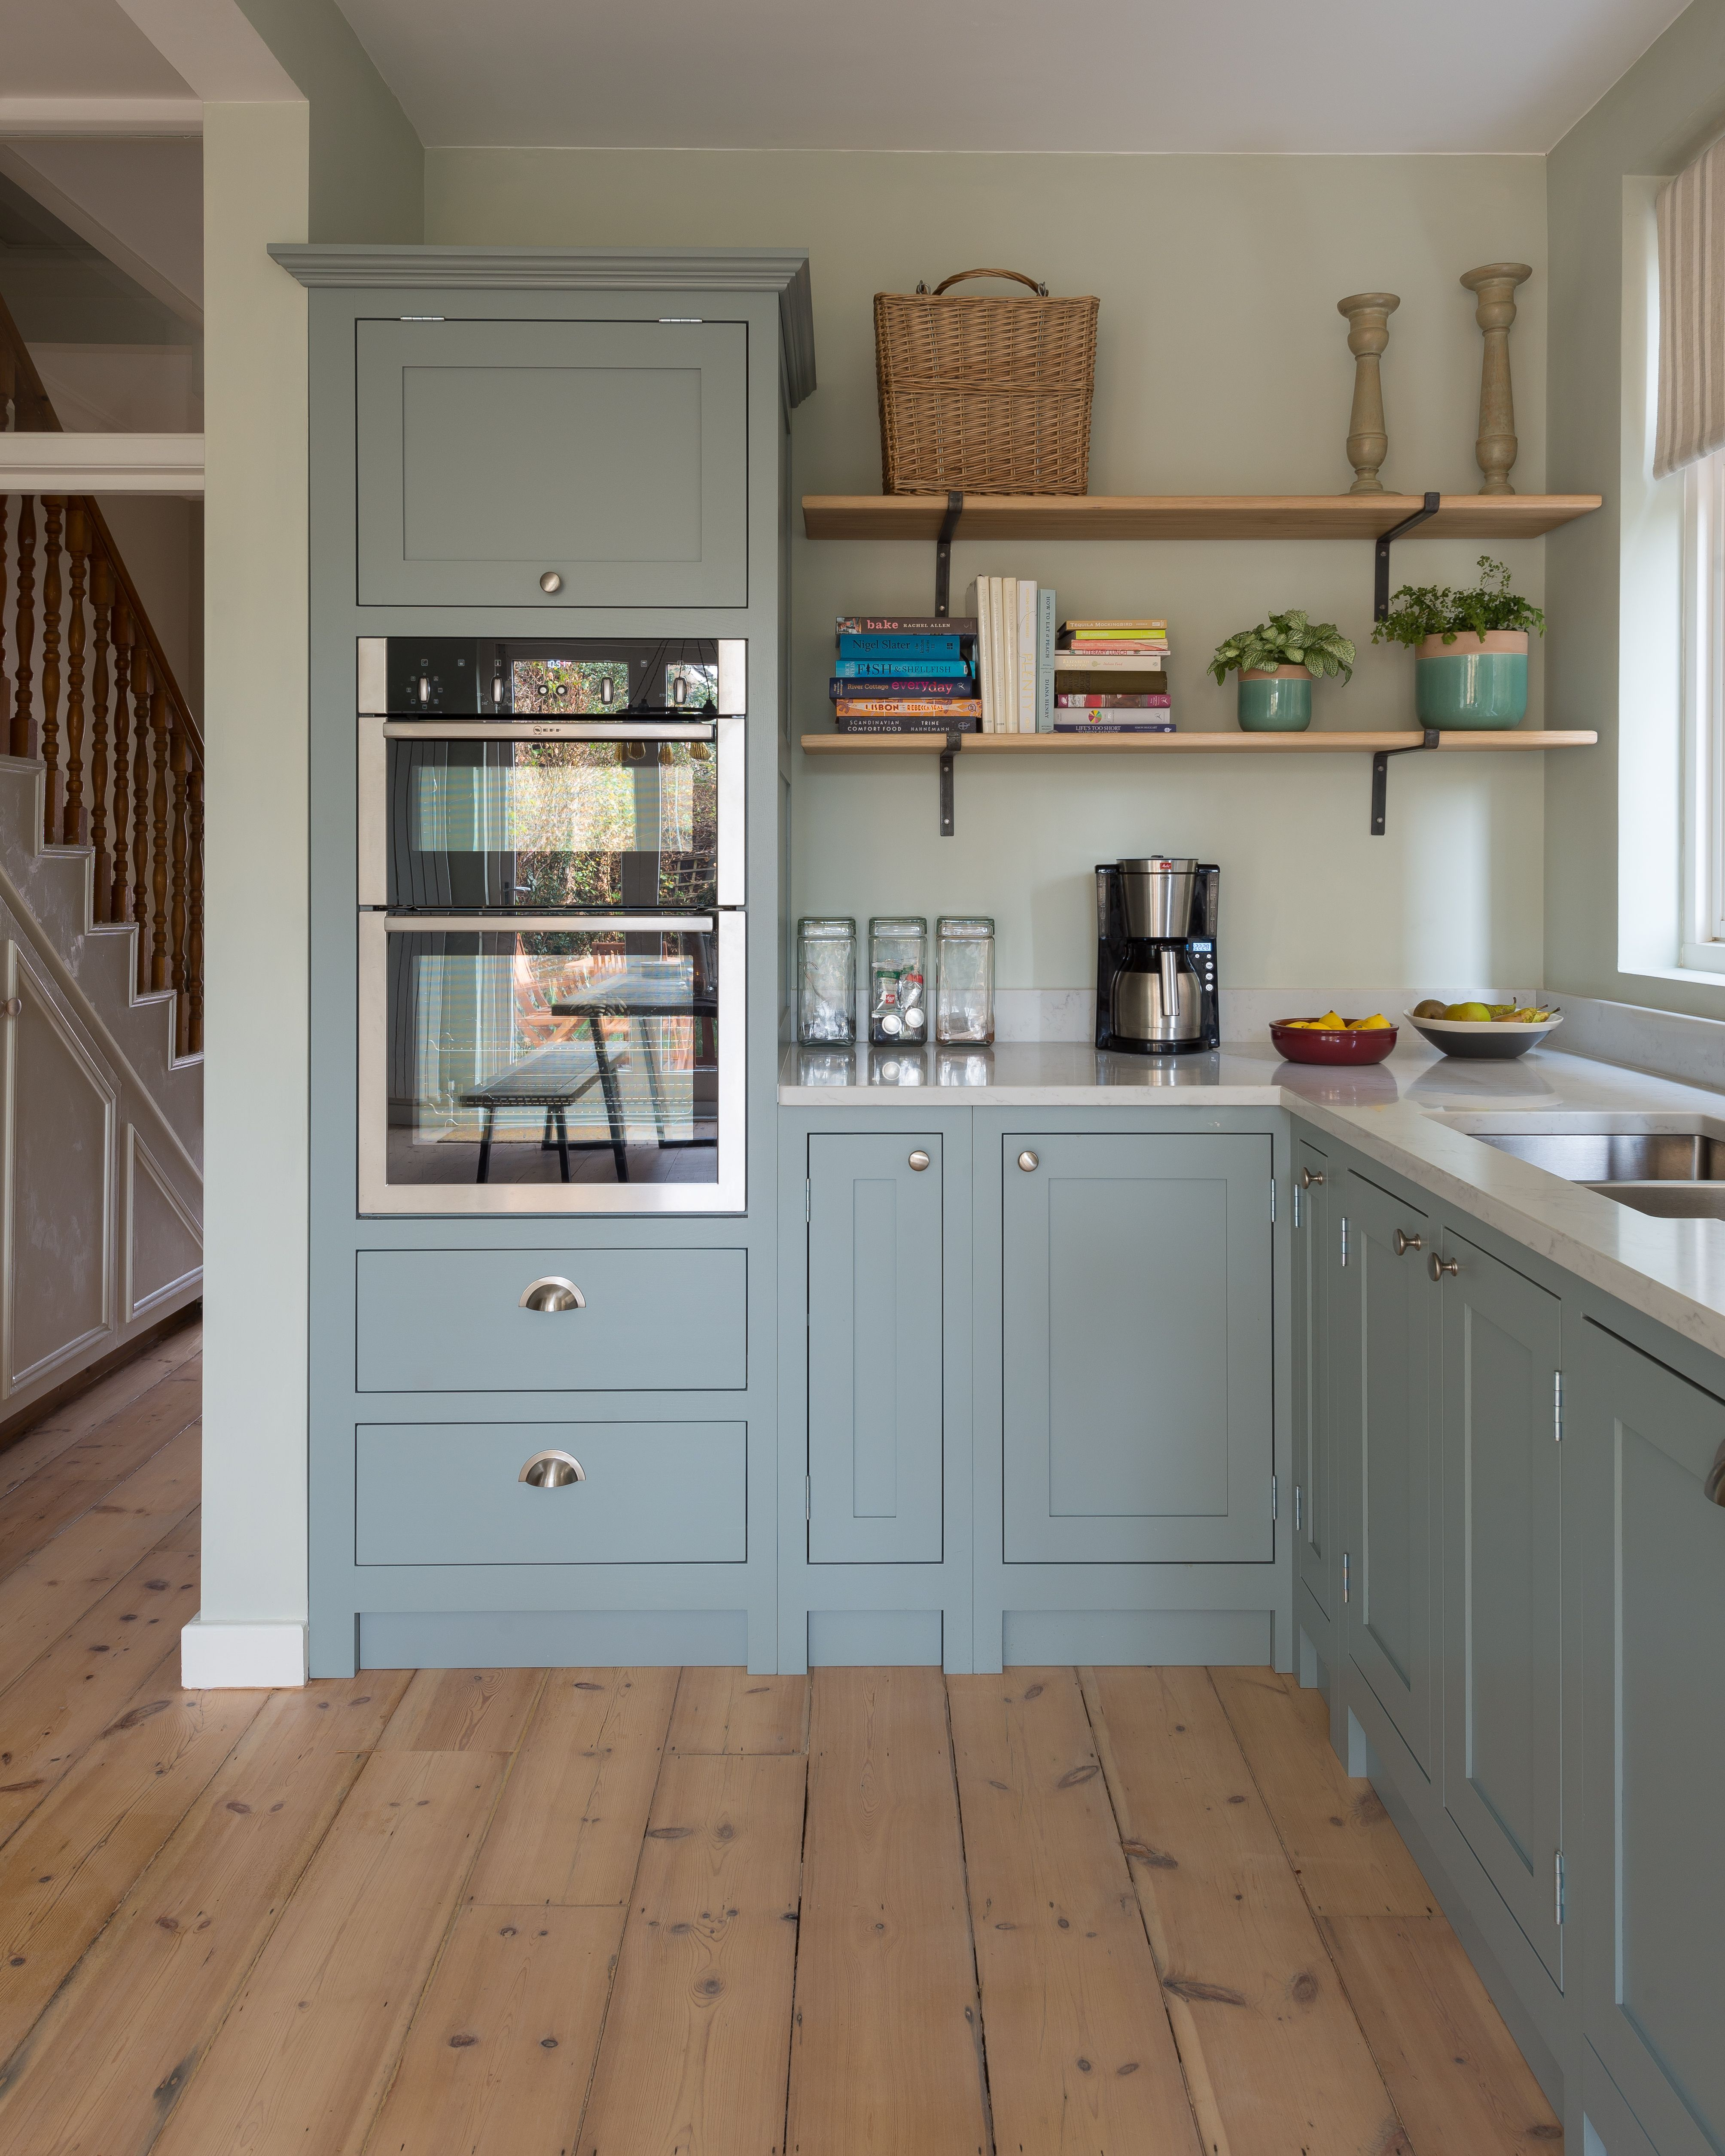 Pale Blue Shaker Kitchen Kitchen Trends Blue Shaker Kitchen Kitchen Design